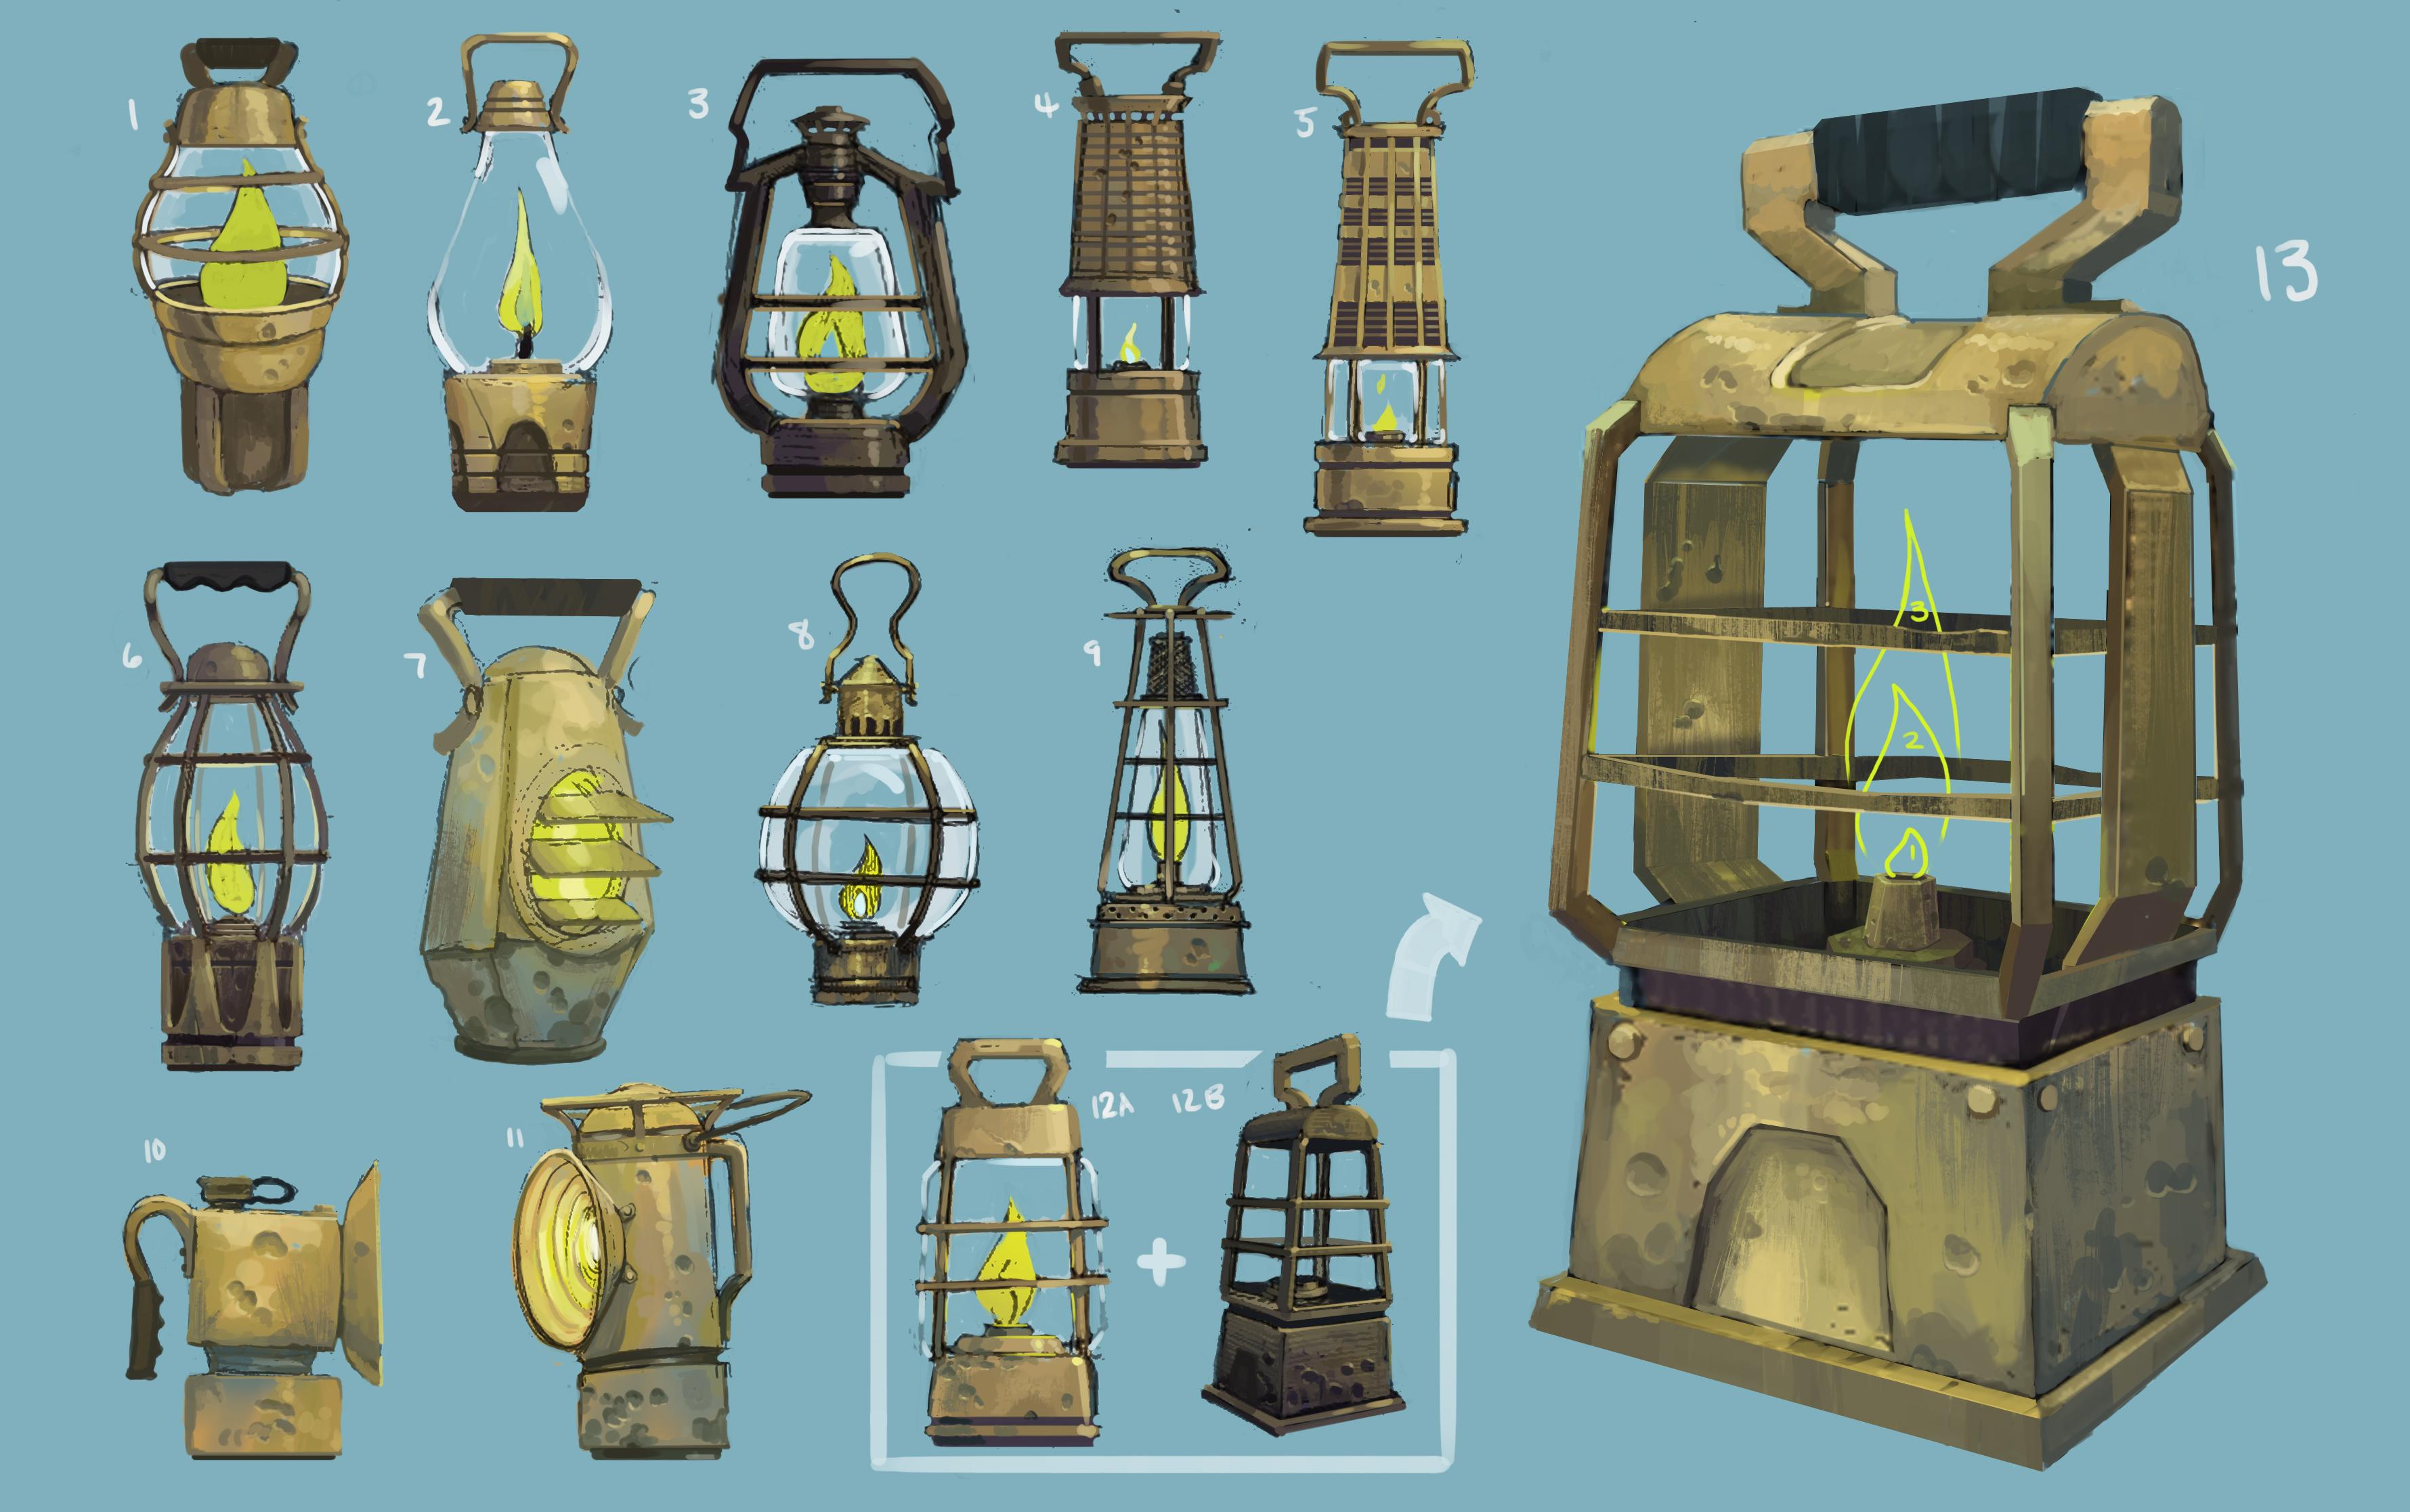 Lantern_CoffeeBean